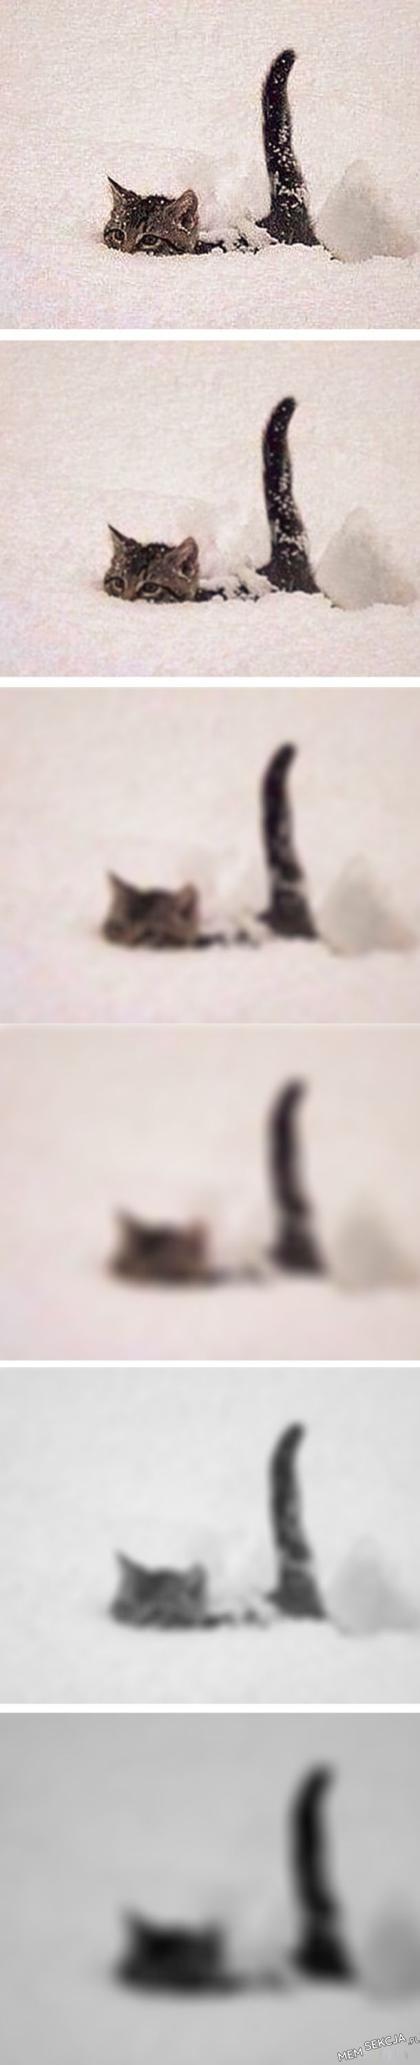 Ten kotek to potwór z Lochness